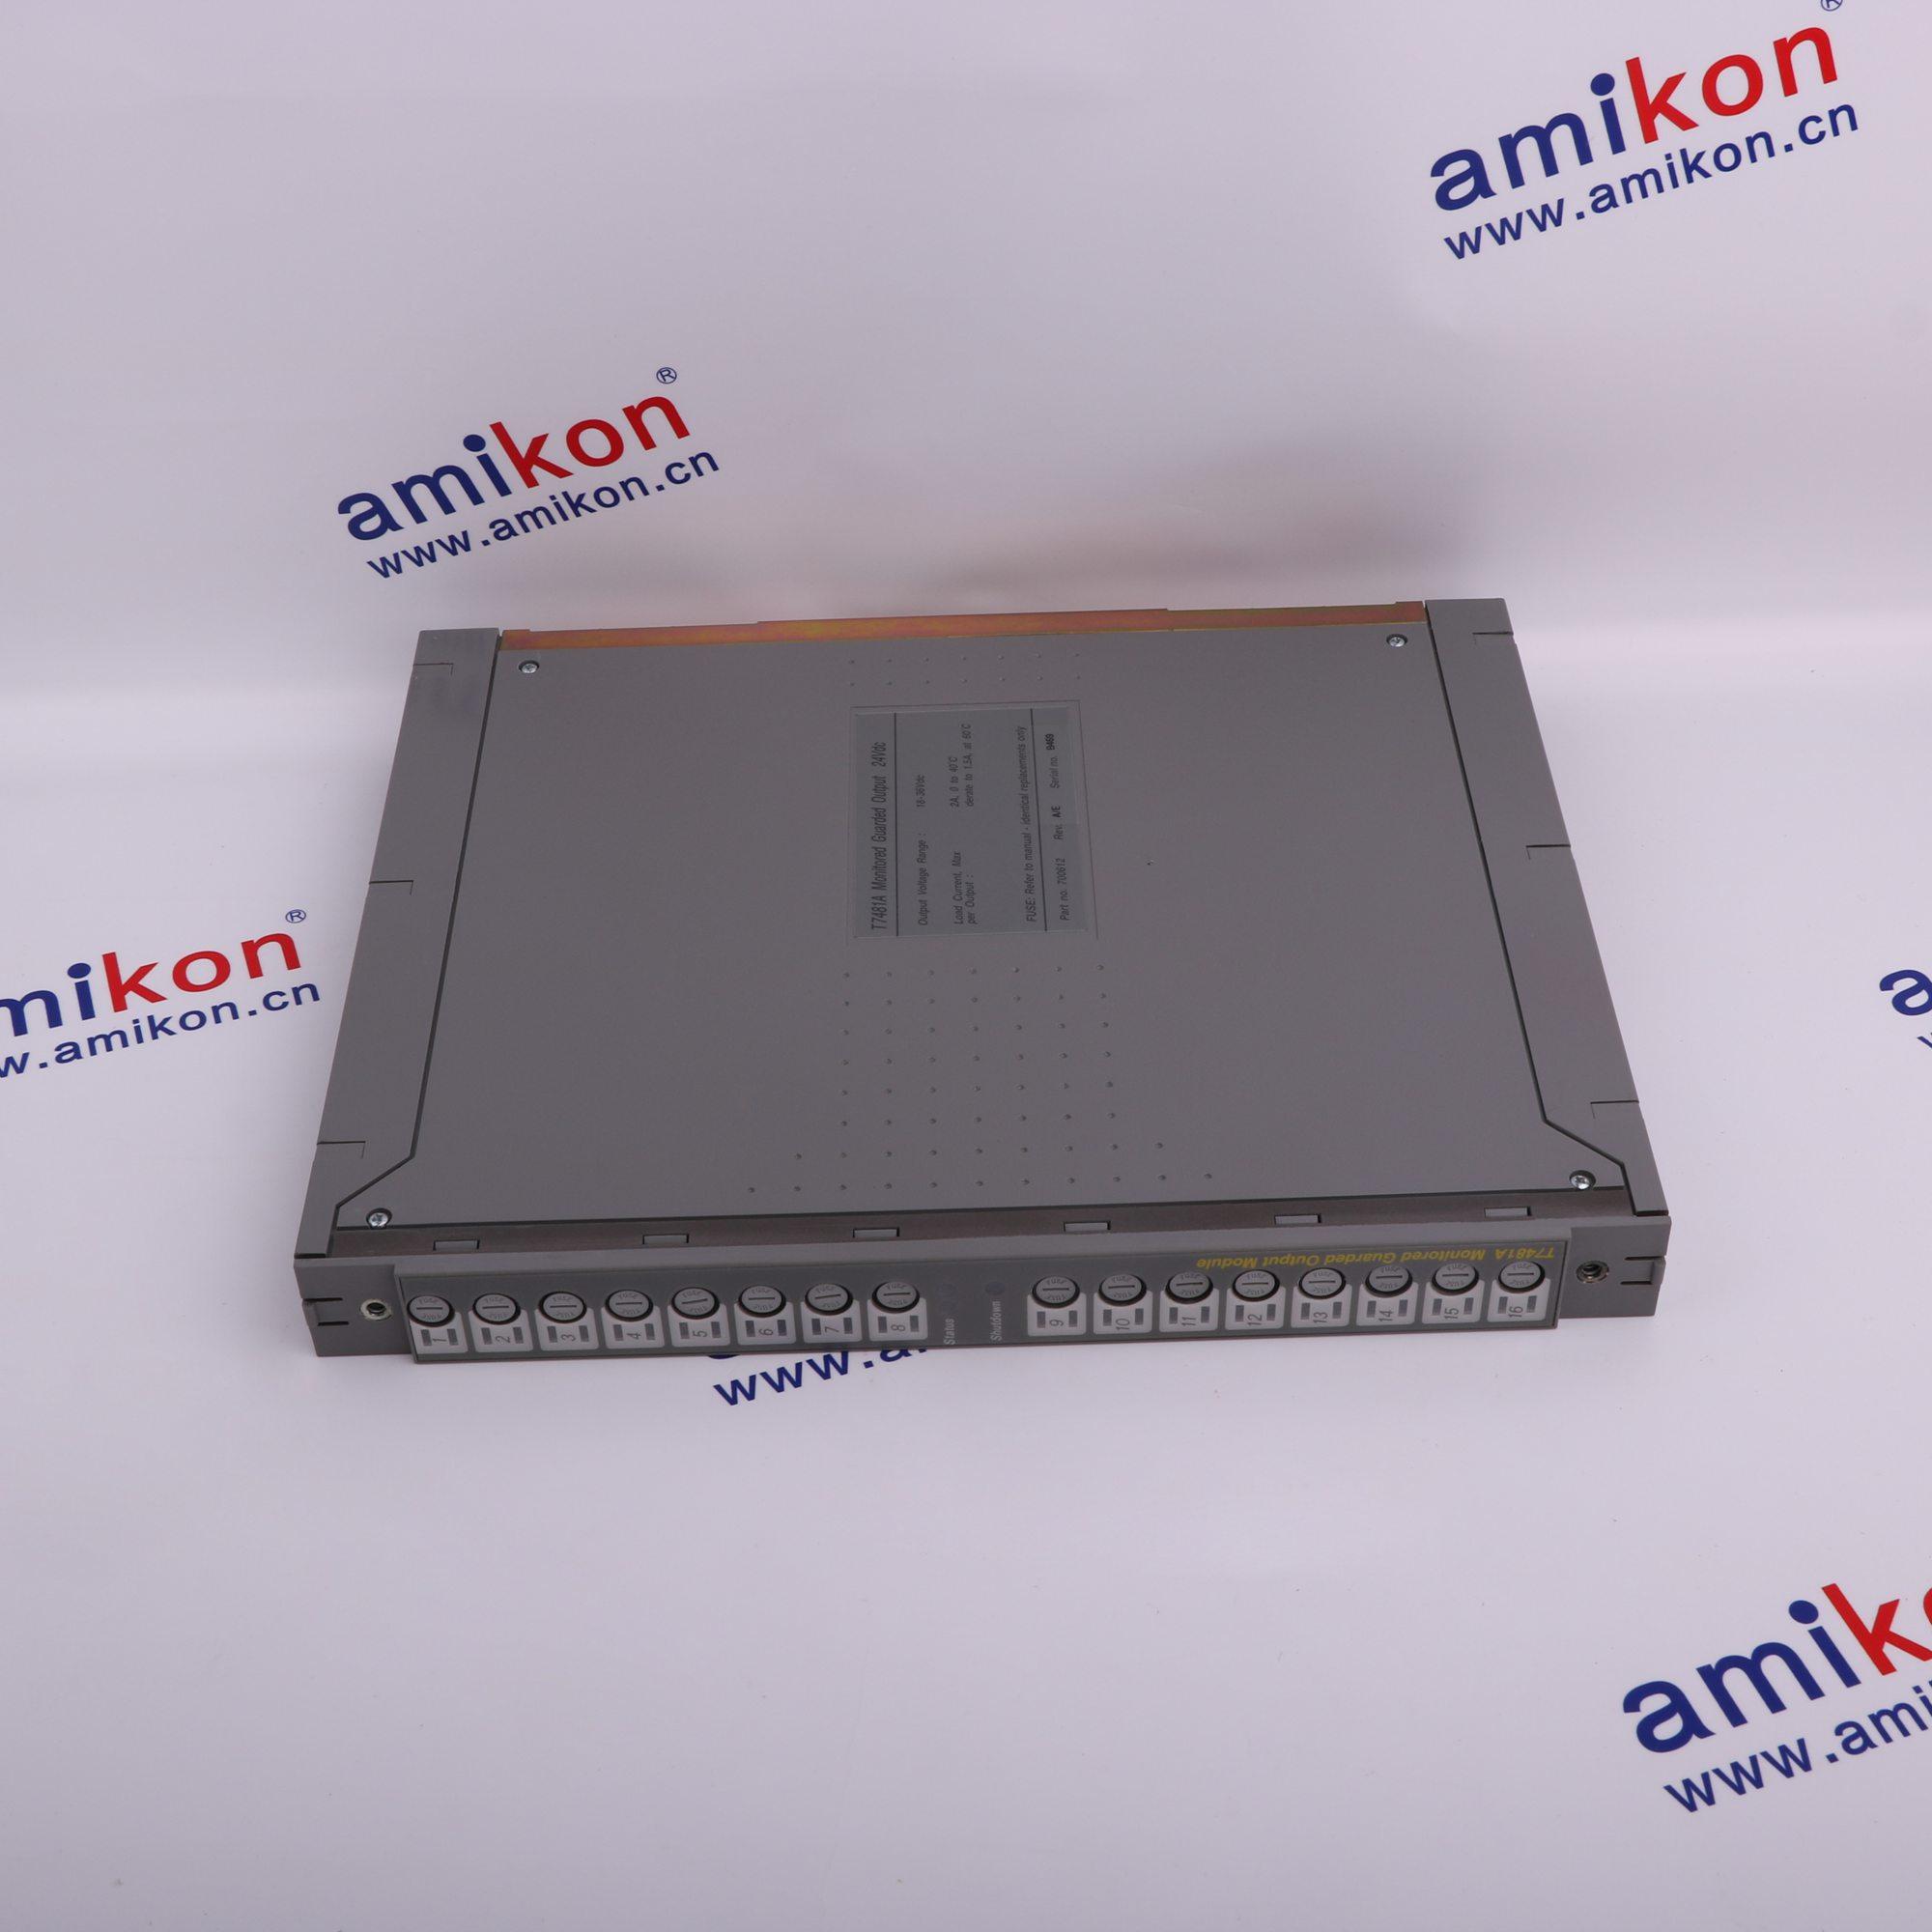 T8402 Trusted Dual 24Vdc Digital Input Module